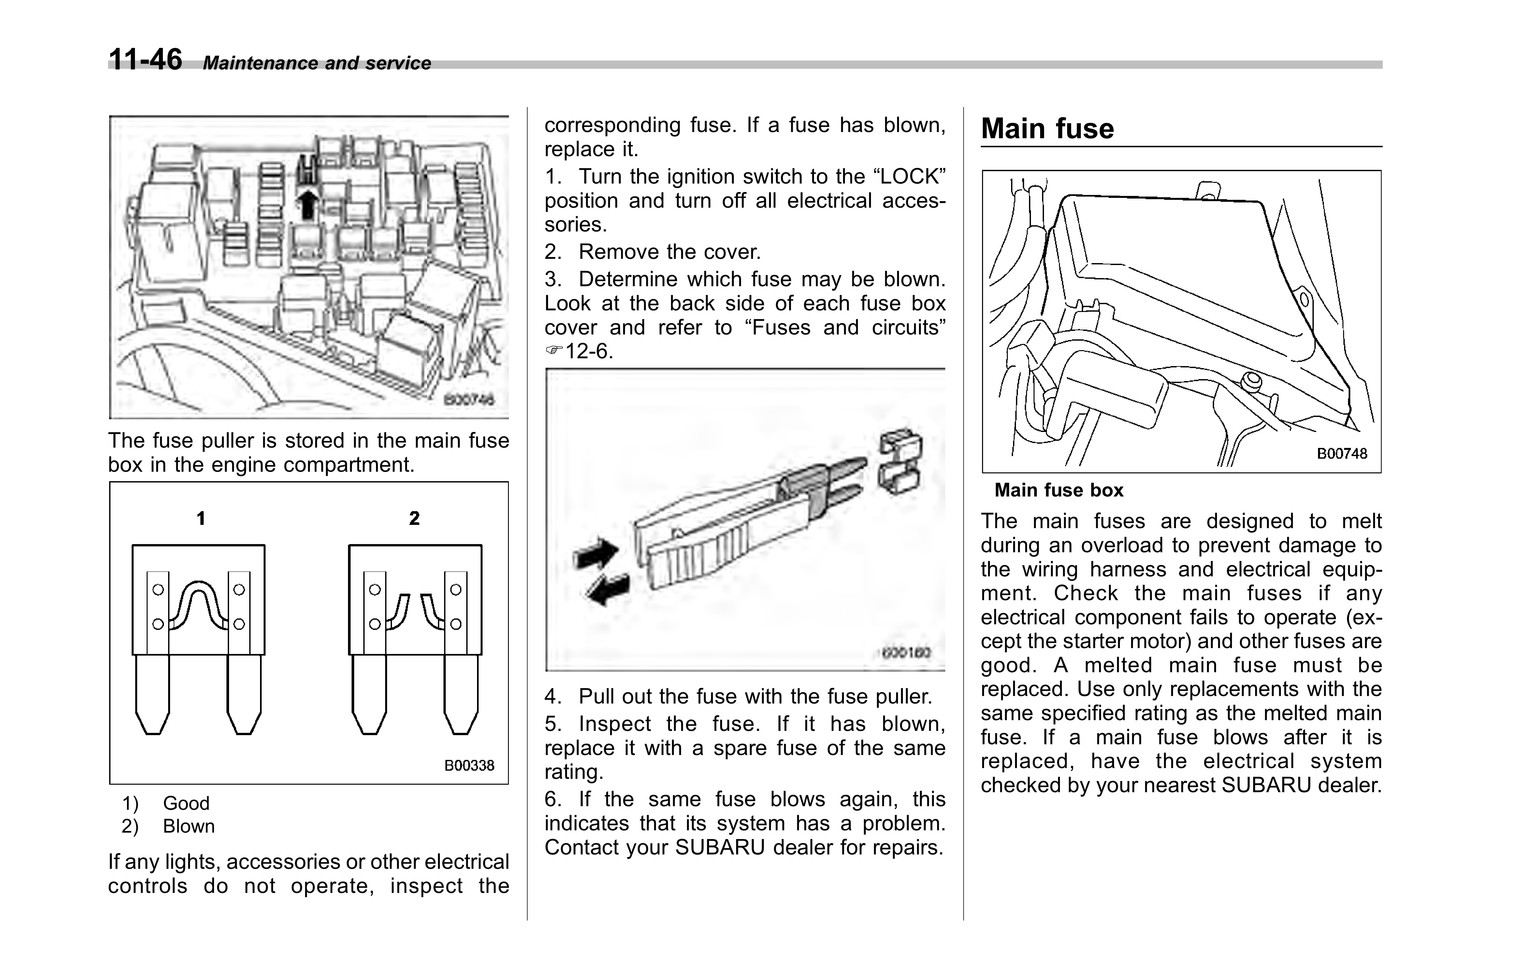 2010 Subaru Forester Fuse Box Diagram Wiring Diagram Drab Horizon Drab Horizon Bowlingronta It